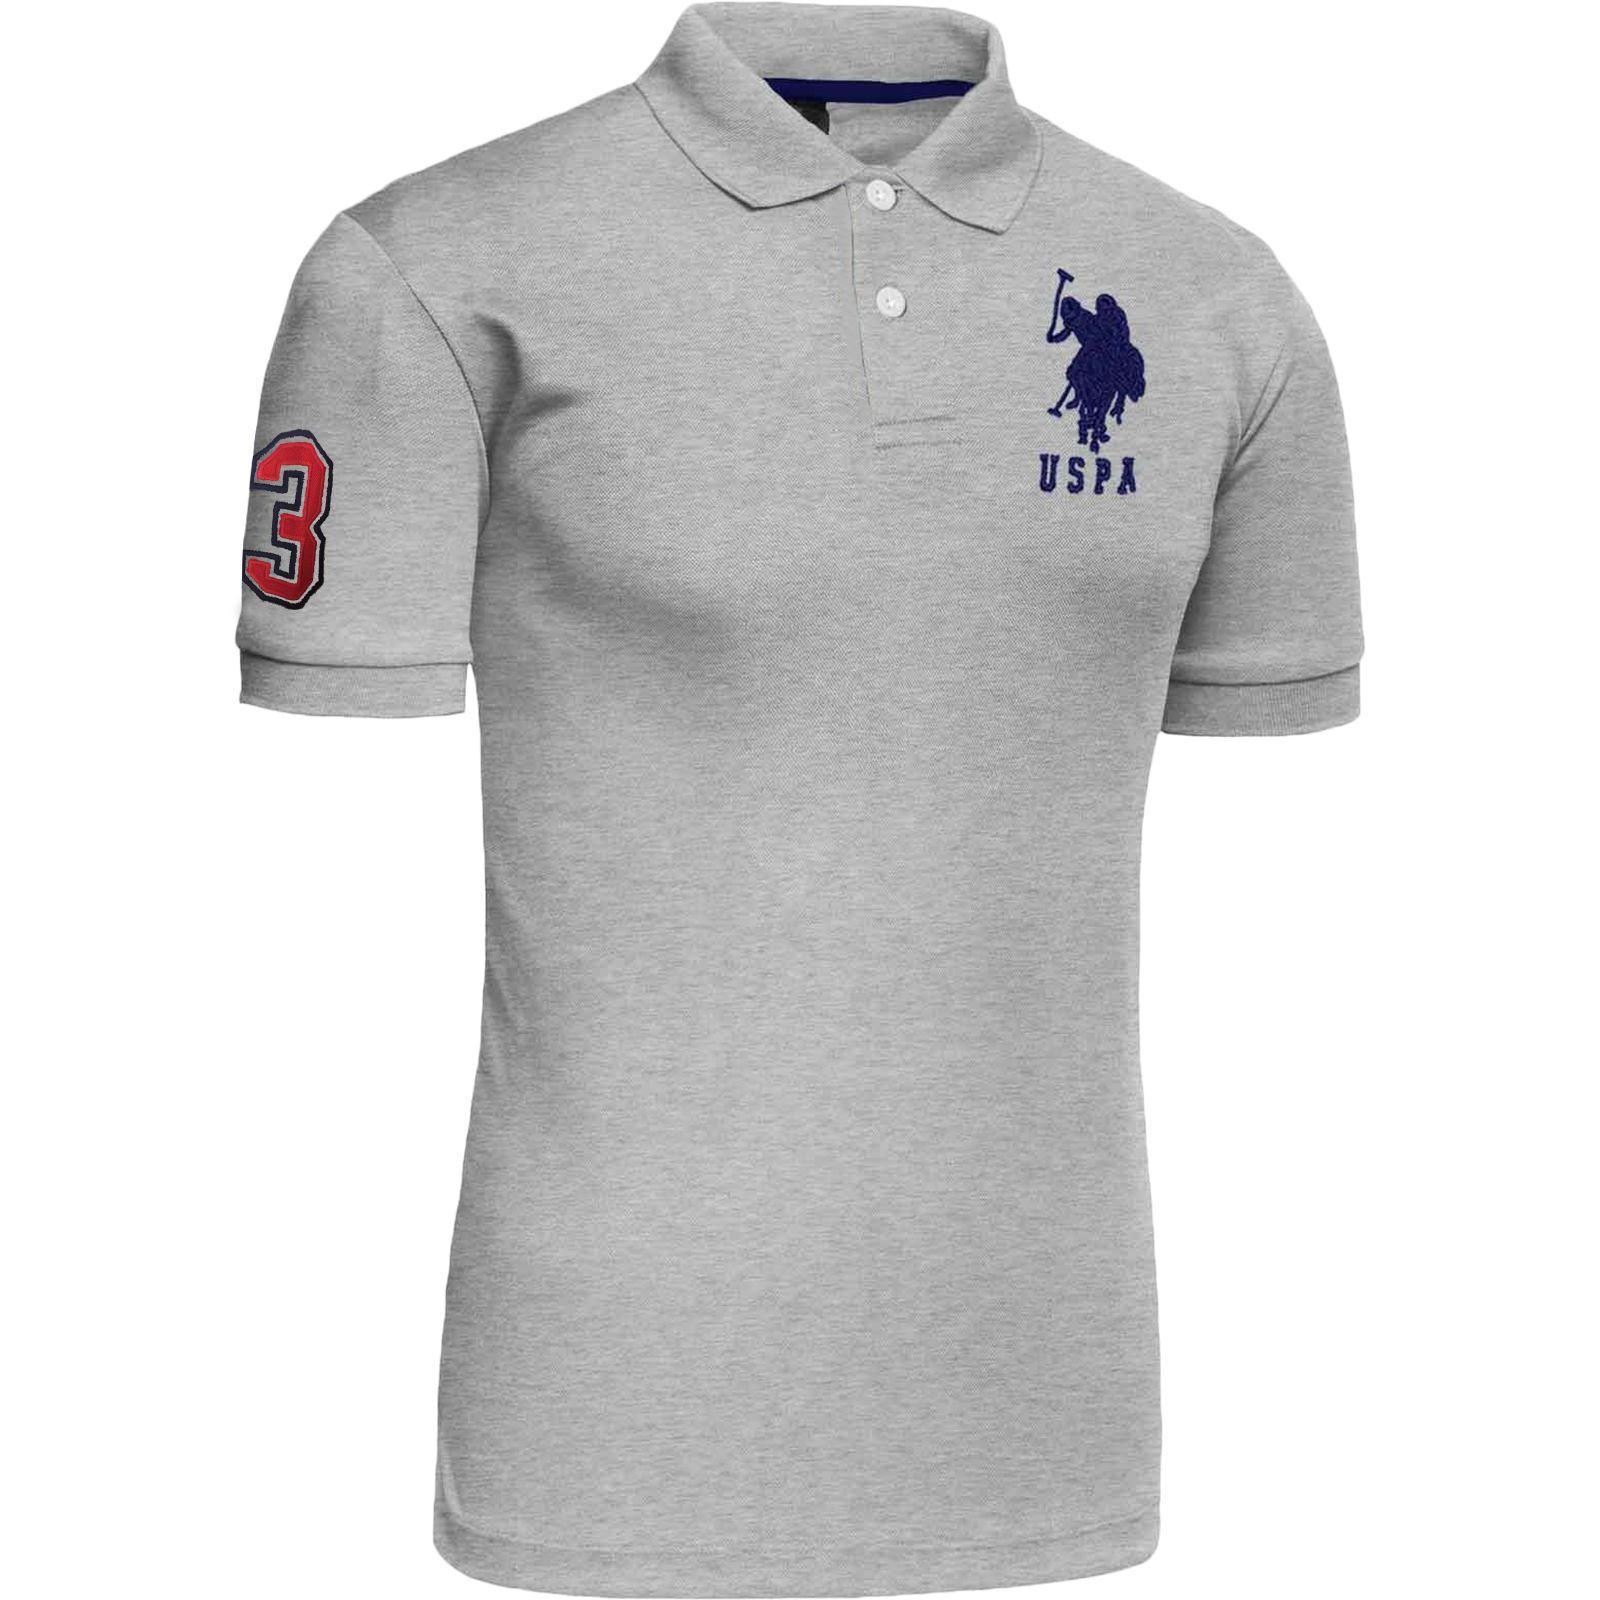 Design t shirt 2017 - Mens Polo Us Polo Assn Tshirt 2017 Design